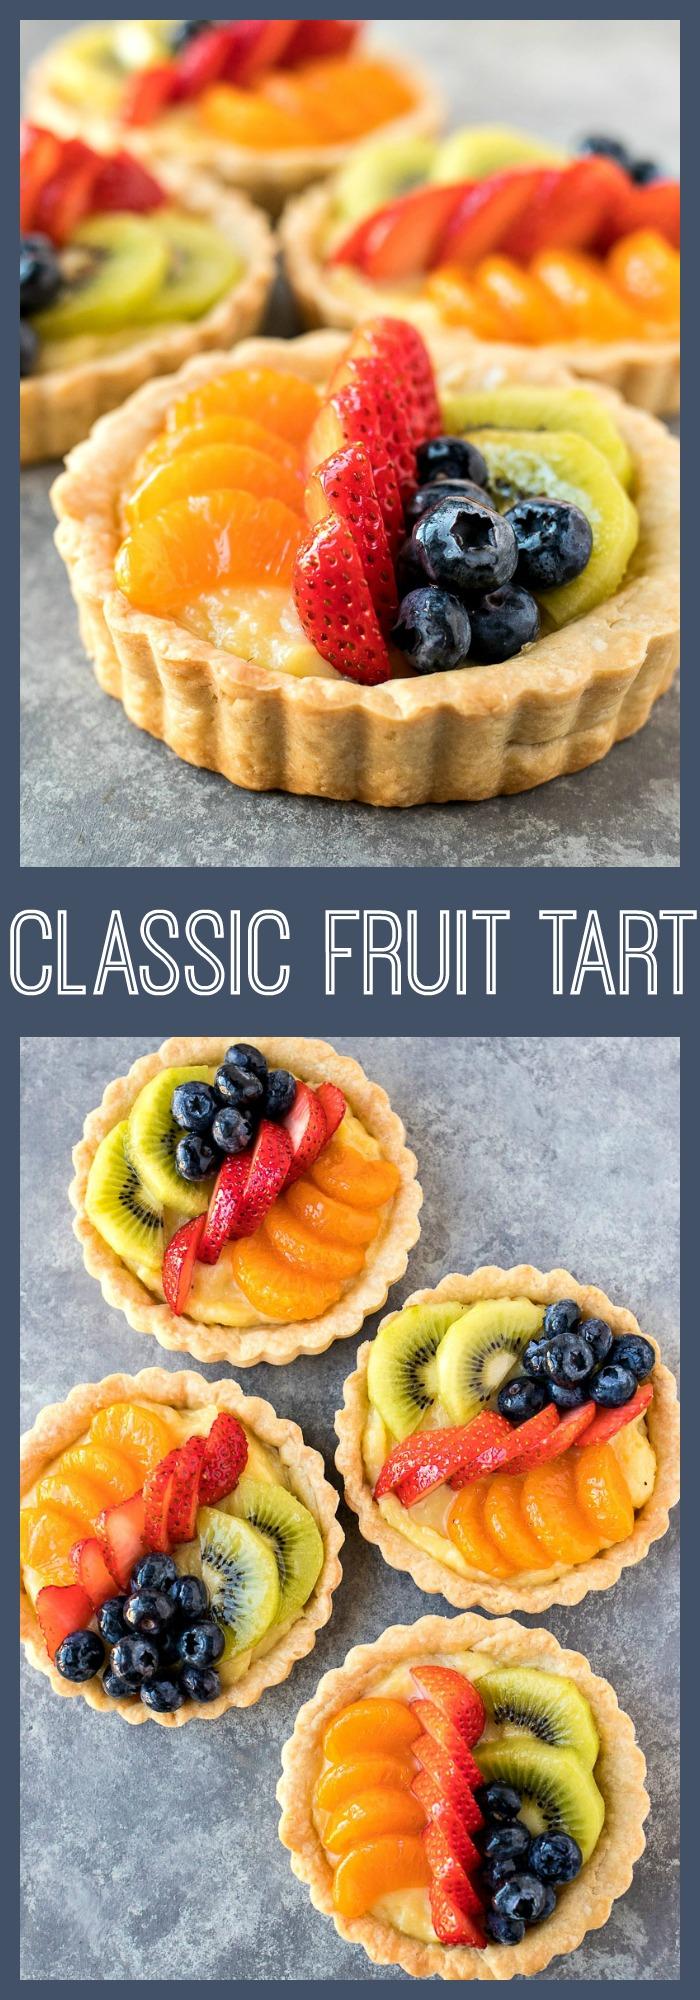 Classic Fruit Tarts photo collage